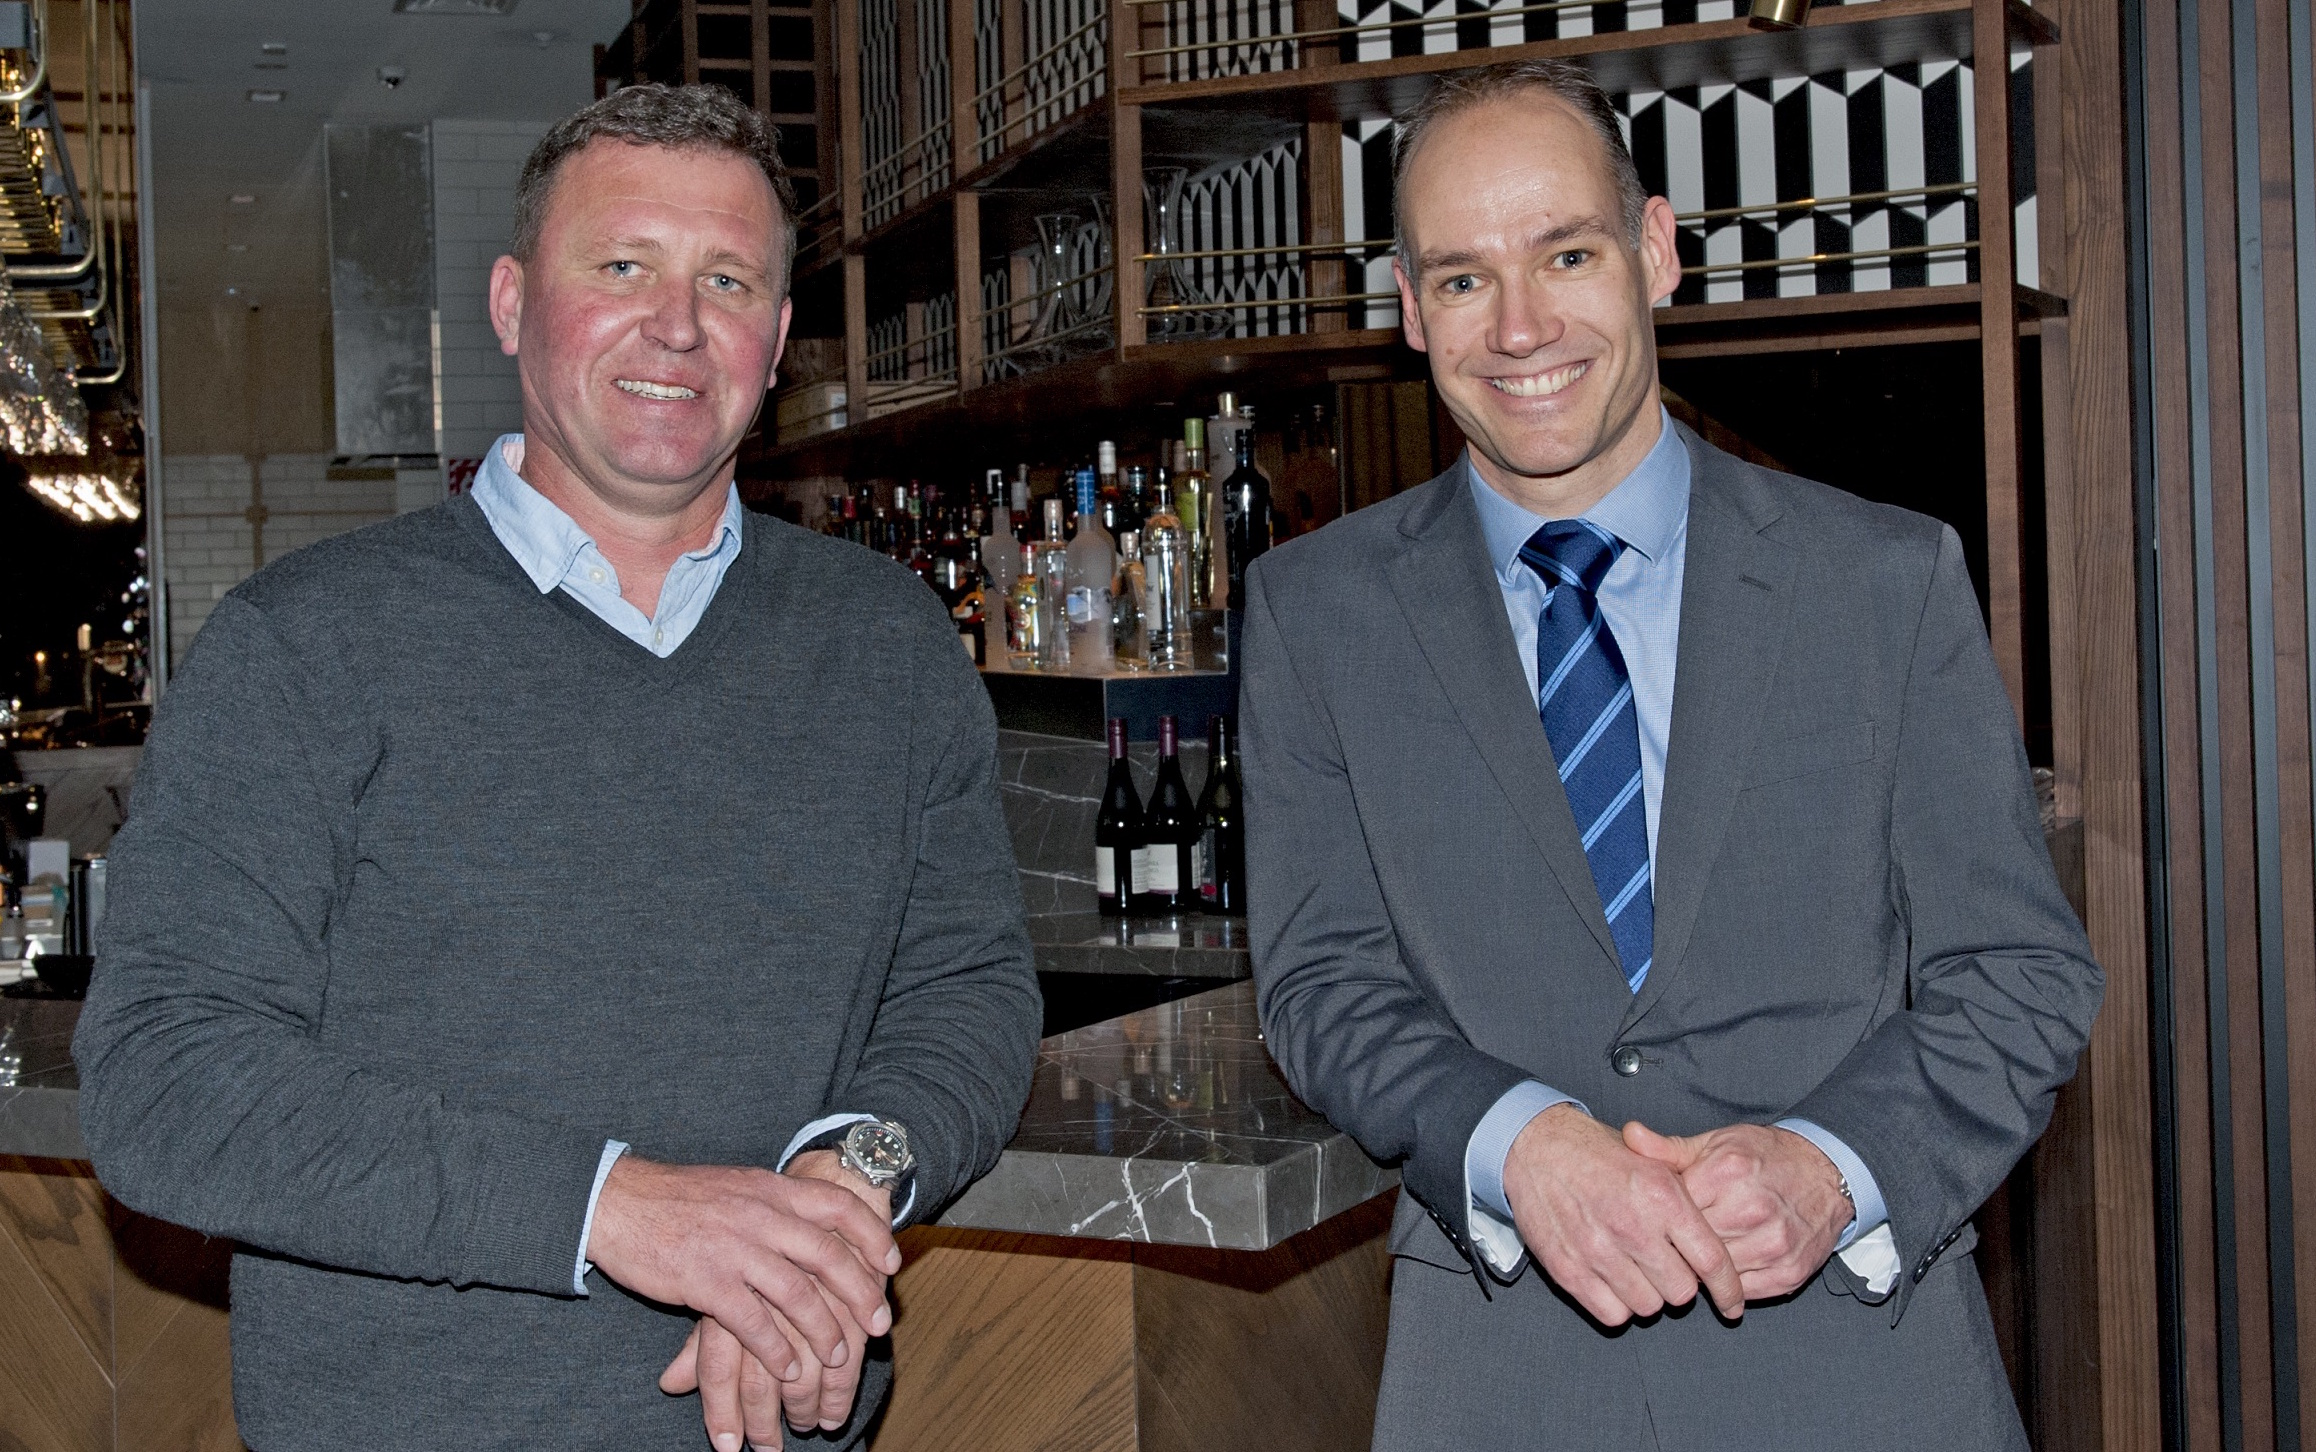 Crowne Plaza Christchurch owner Shane Le Compte and General Manager Reinier Eulink_Credit Antoinette Baker